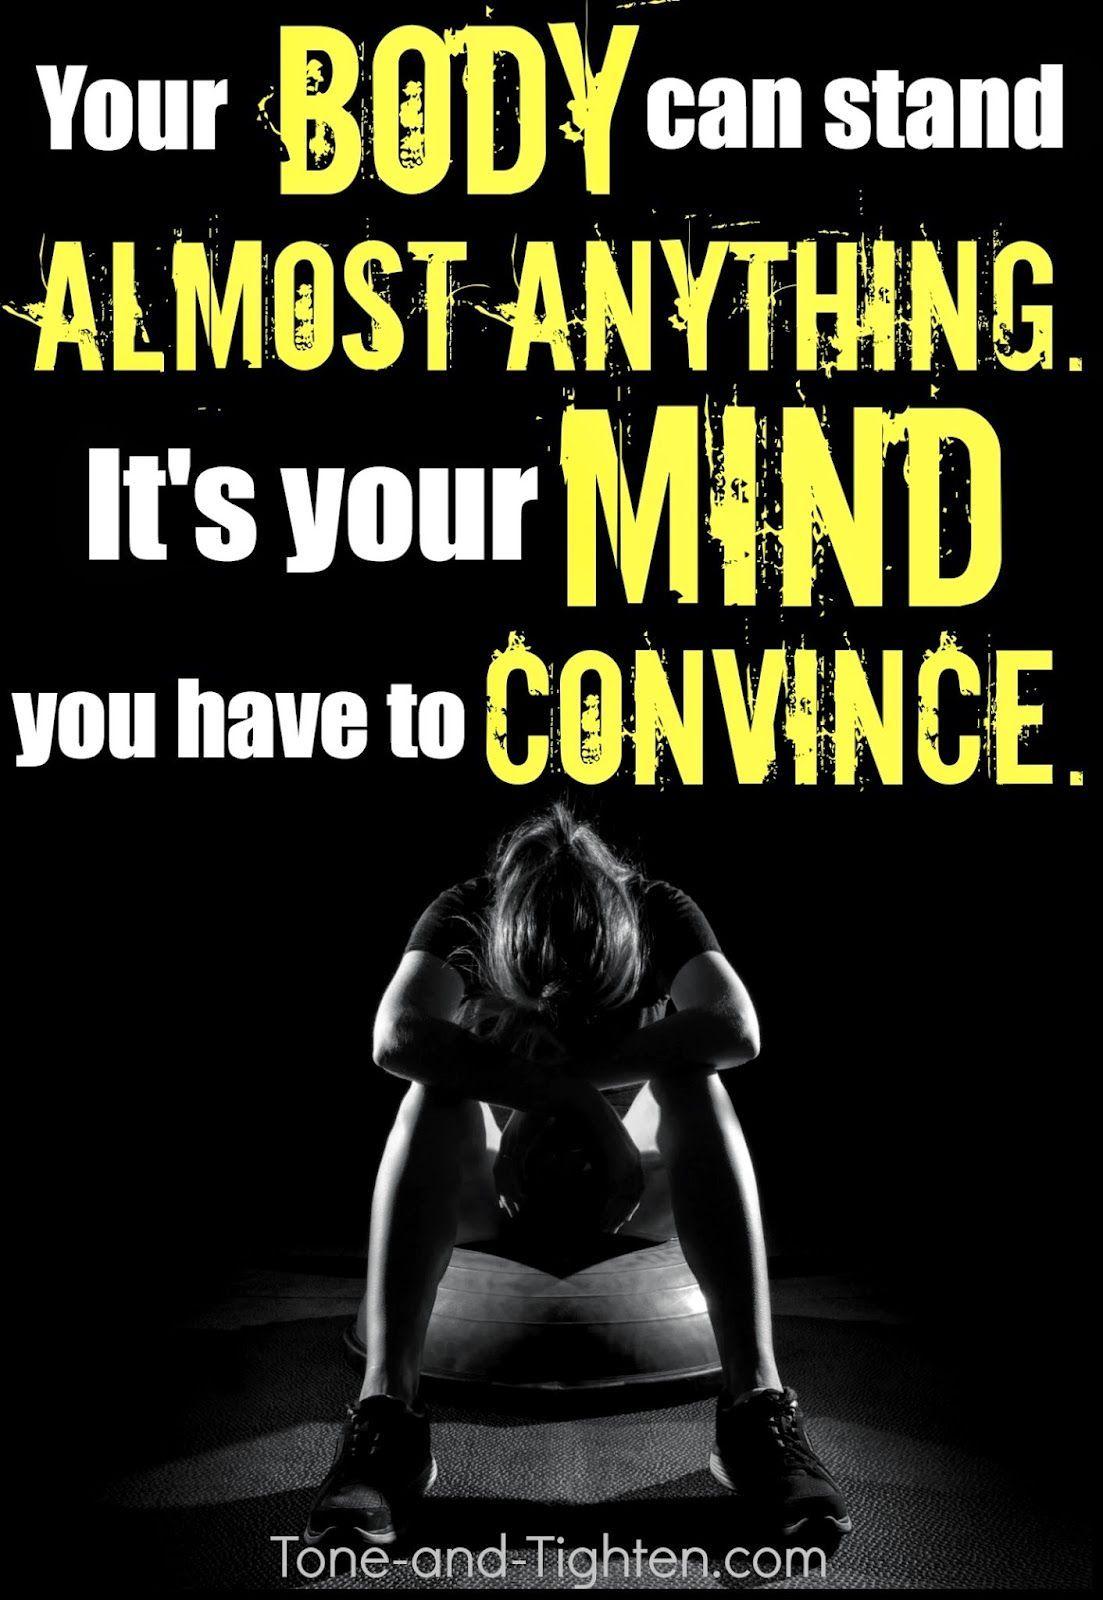 #toneandtightencom #inspiration #motivation #potential #anything #exercise #realize #fitness #hardes...